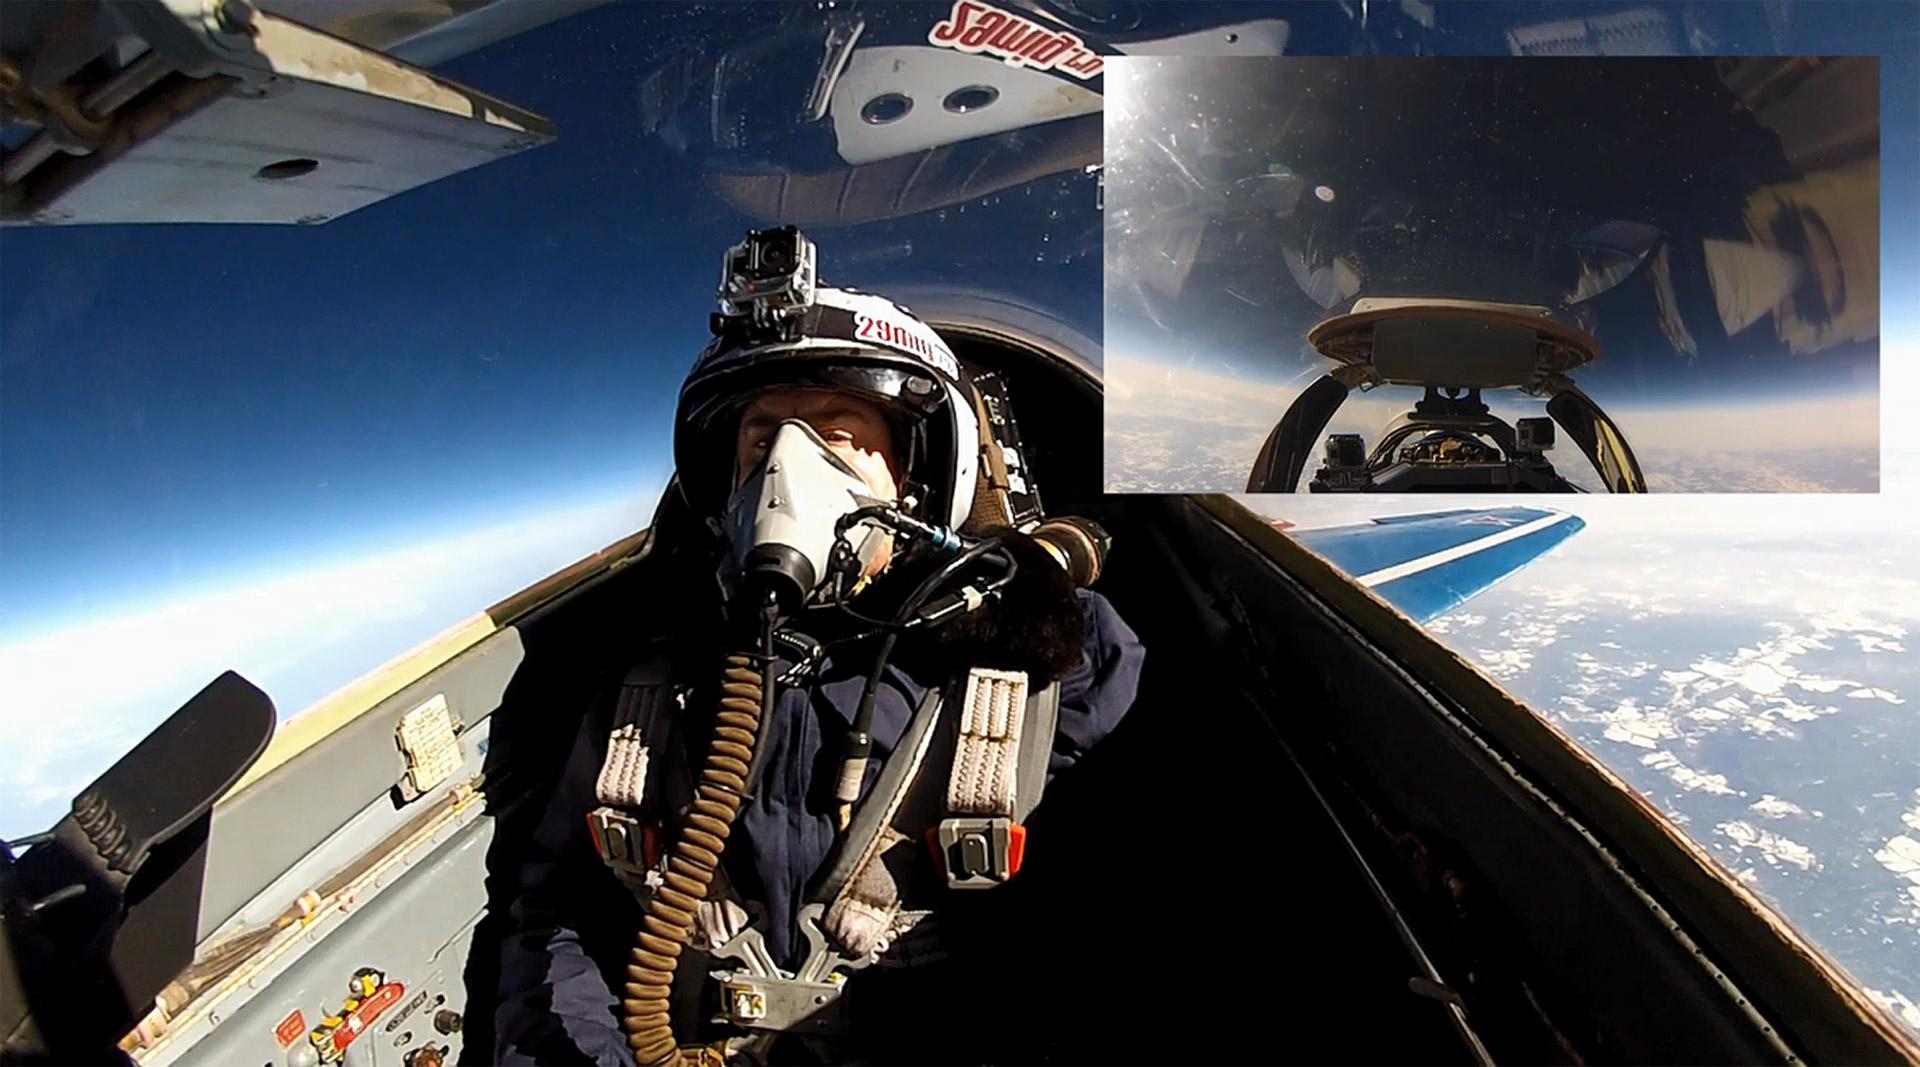 vol-stratospherique-mig-29-russie